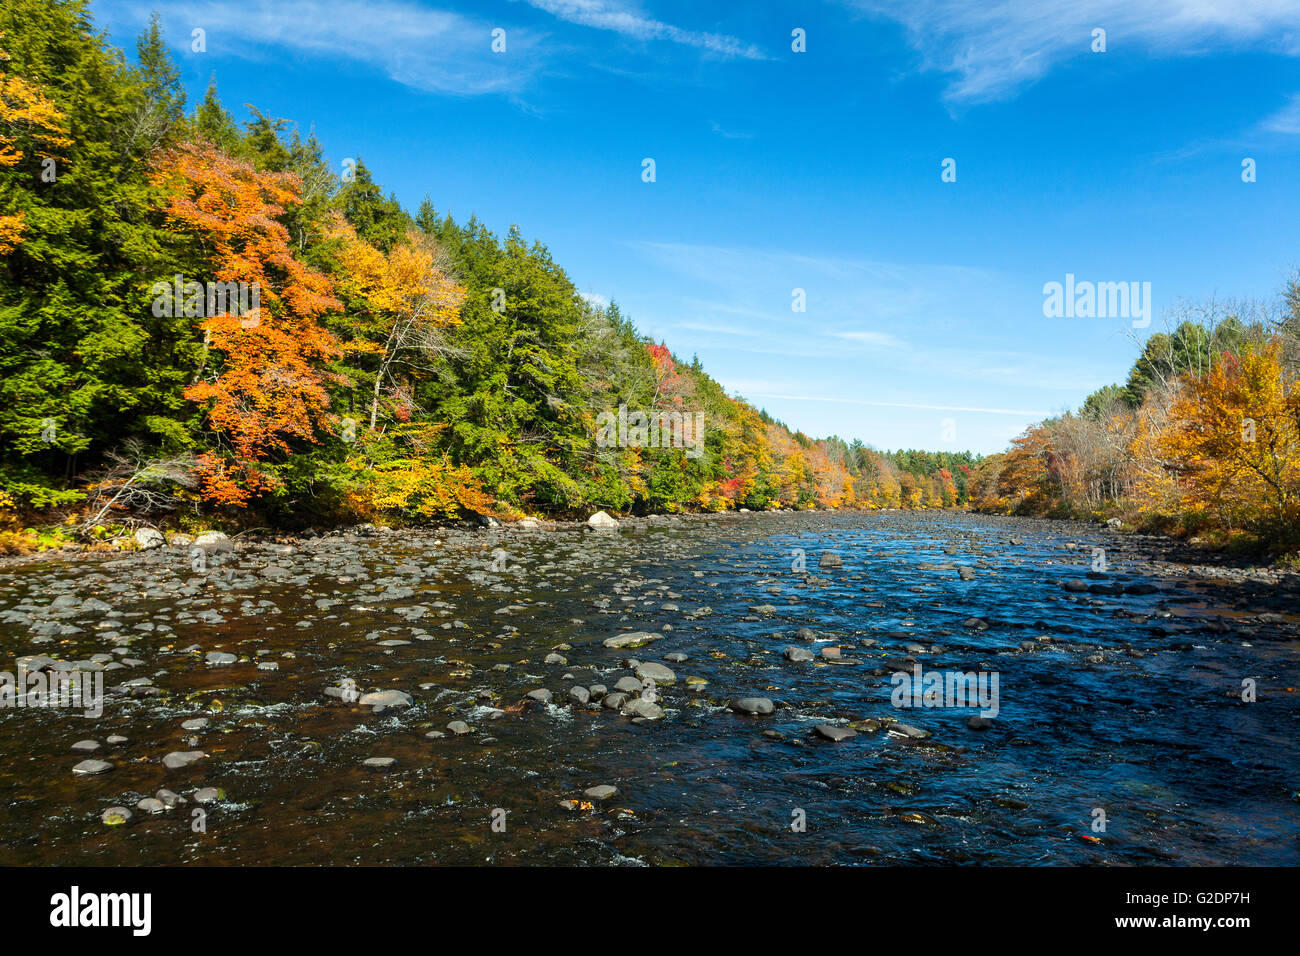 Trees in fall on Sacandaga River, Adirondack Mountains, Wells, New York, United States - Stock Image